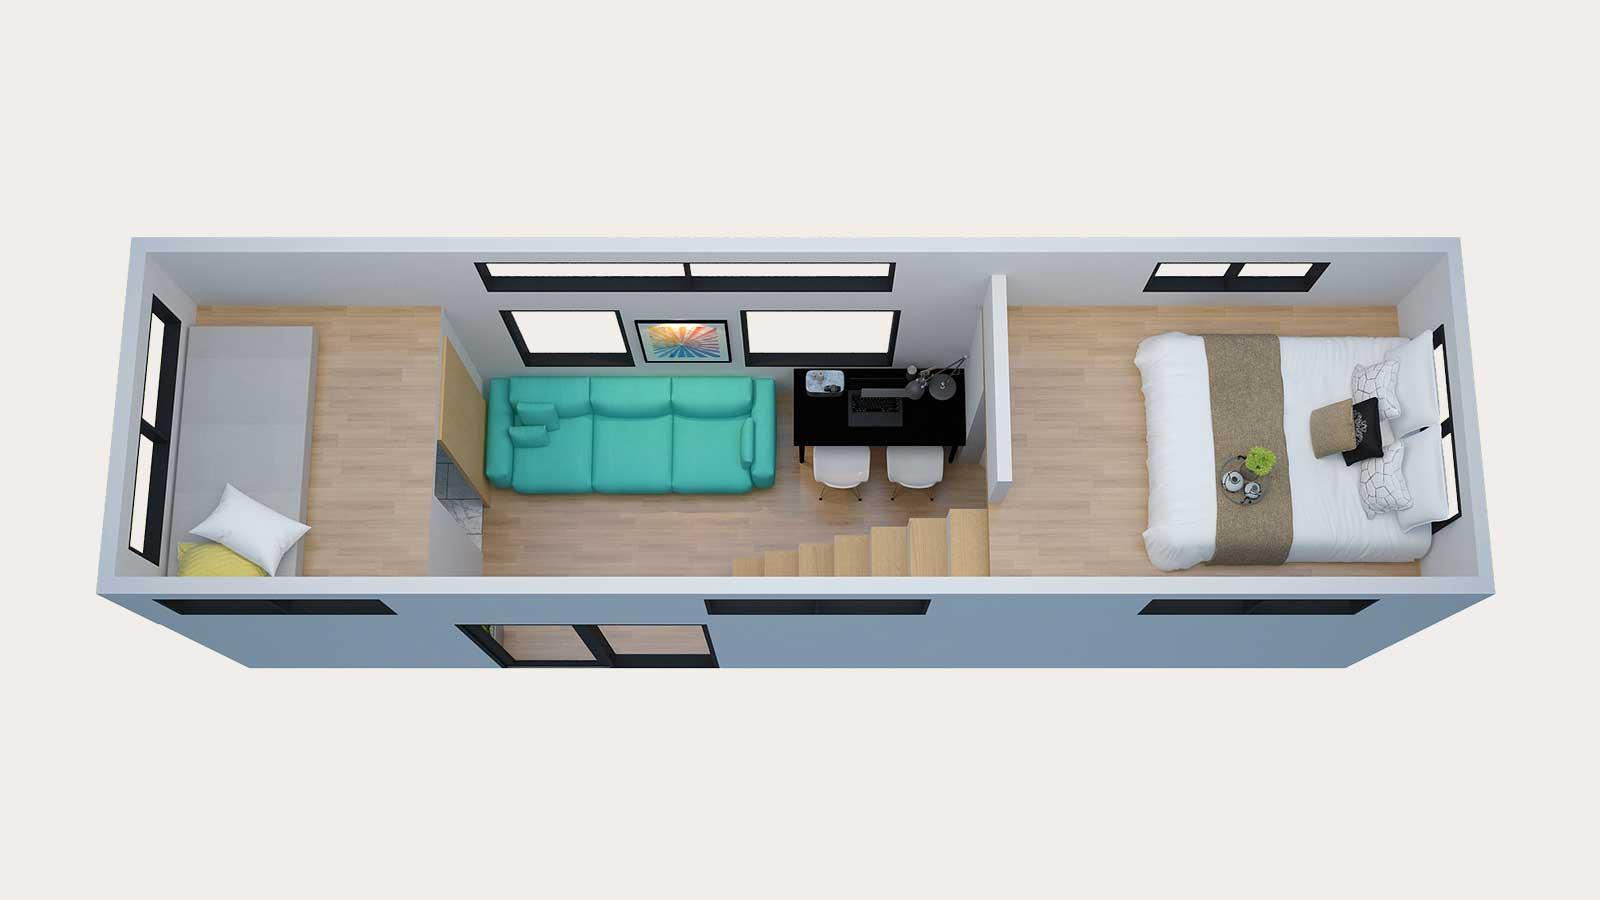 Floor plans of tiny home model - loft